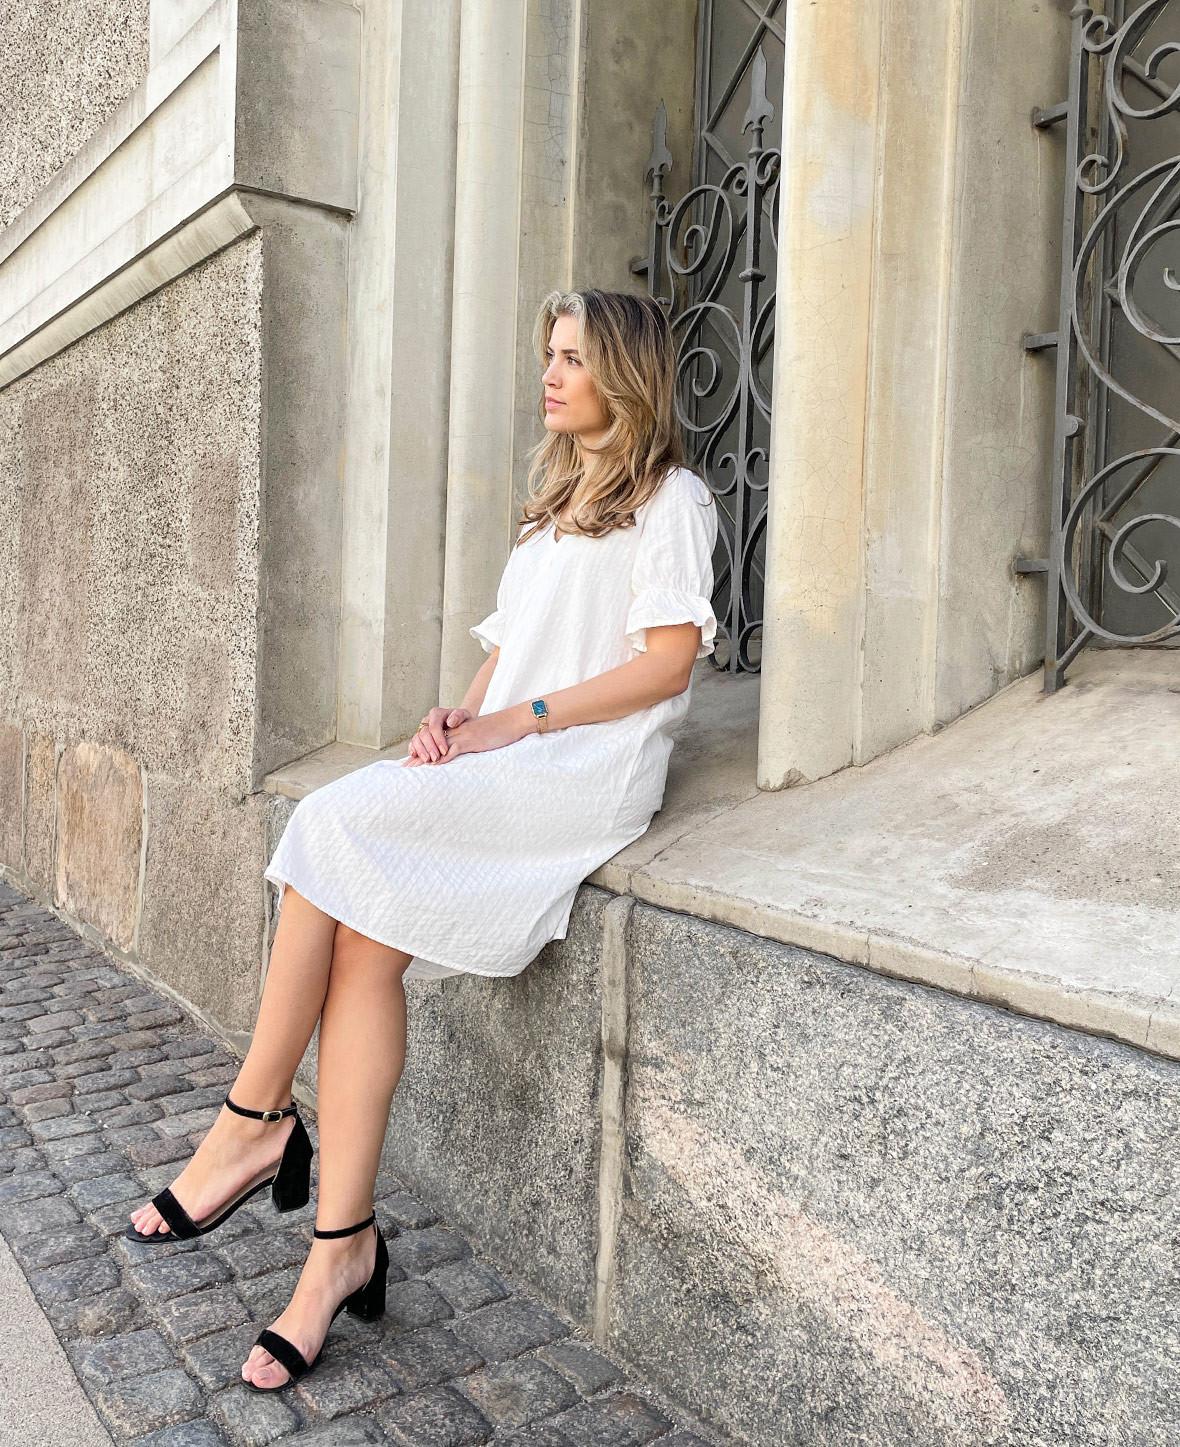 blog-hvide-kjoler-pieces-damemode.jpg